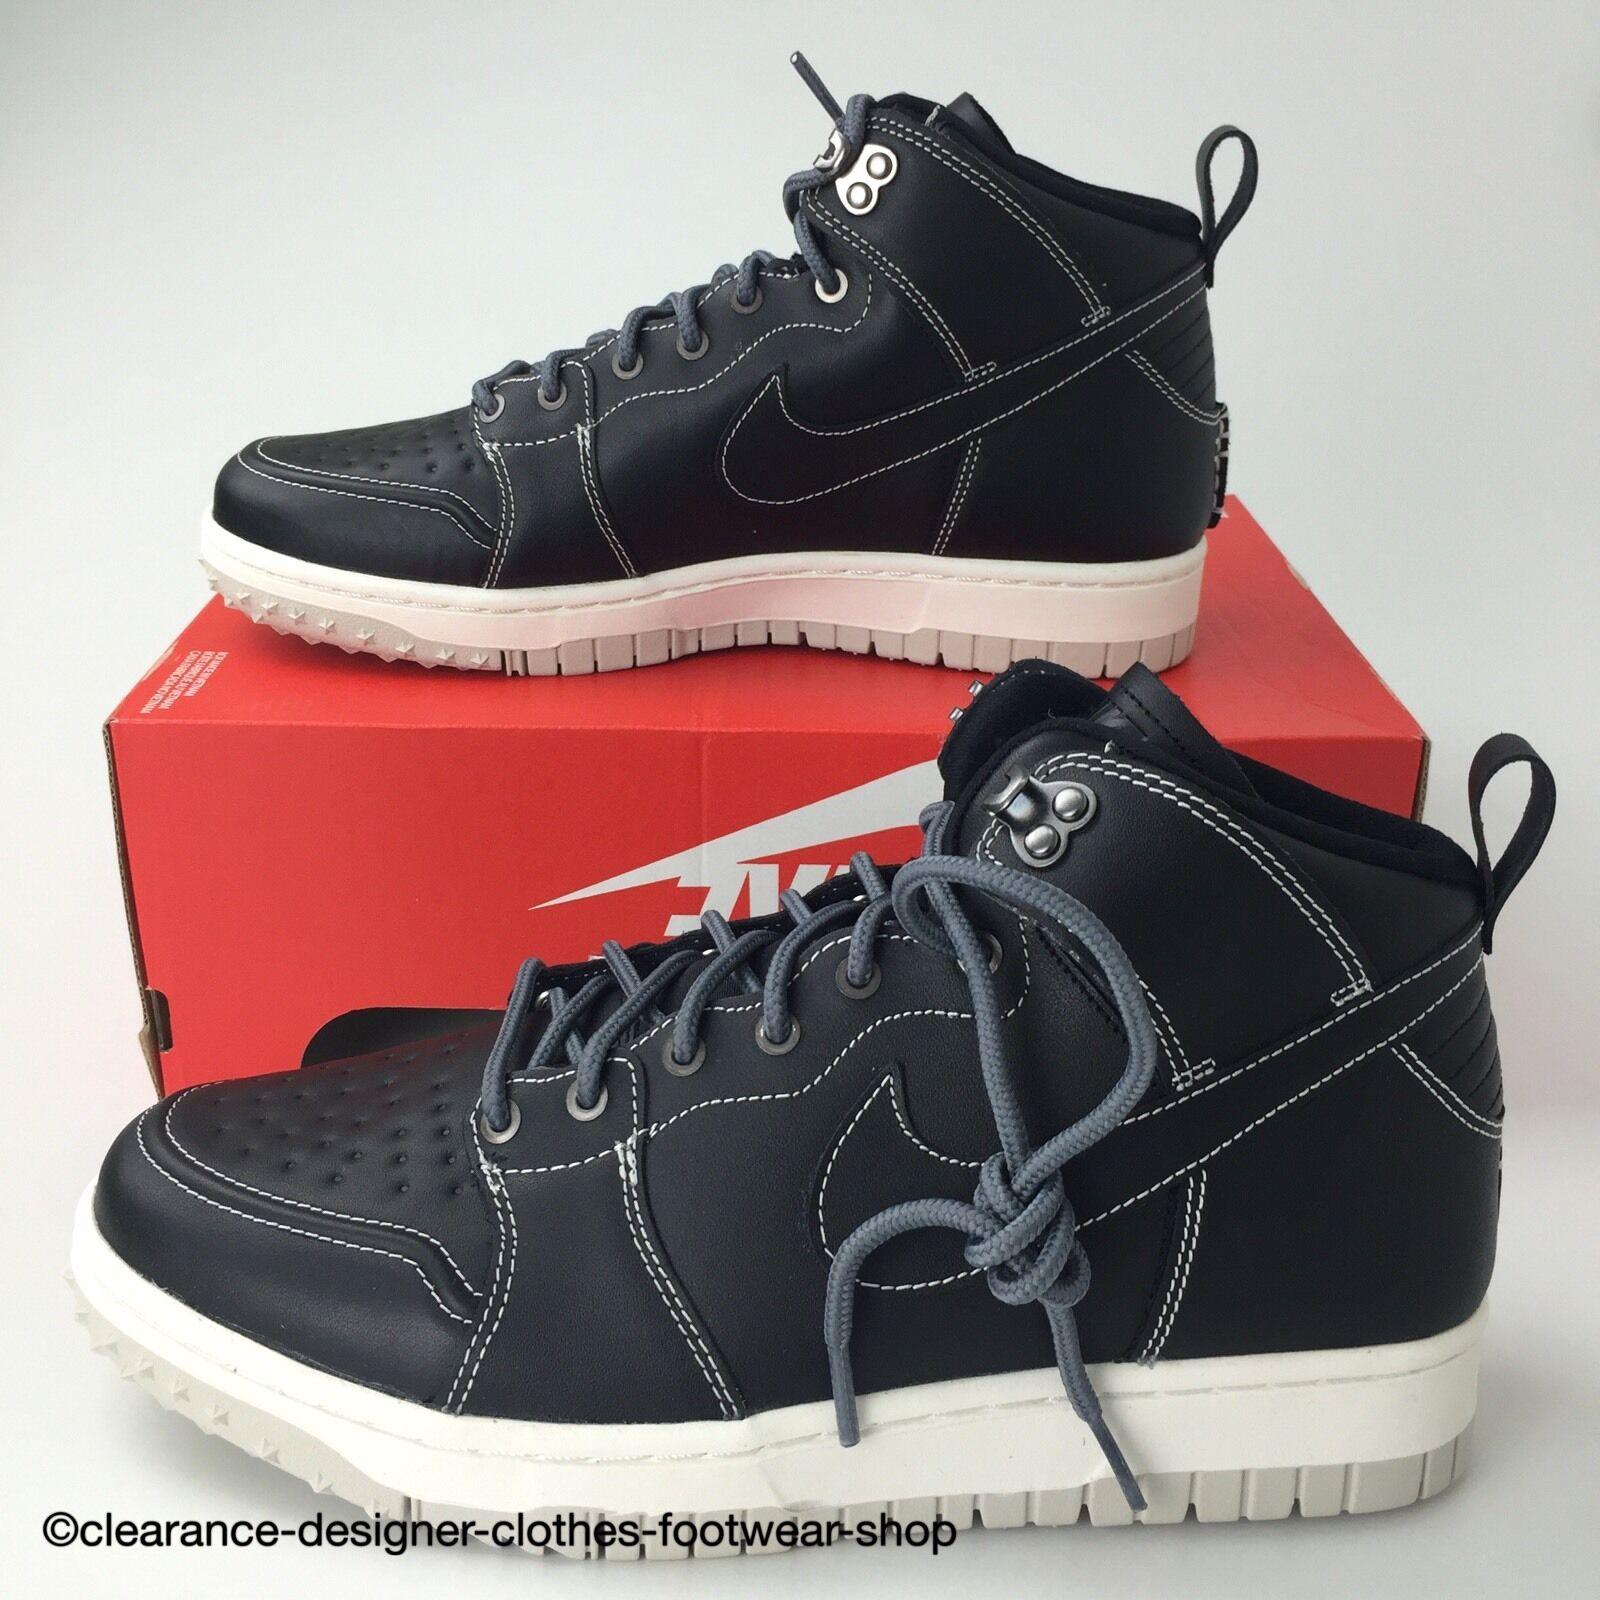 NIKE DUNK CMFT WB para Hombre Negro botas Zapatos De Senderismo walkng Confort RRP